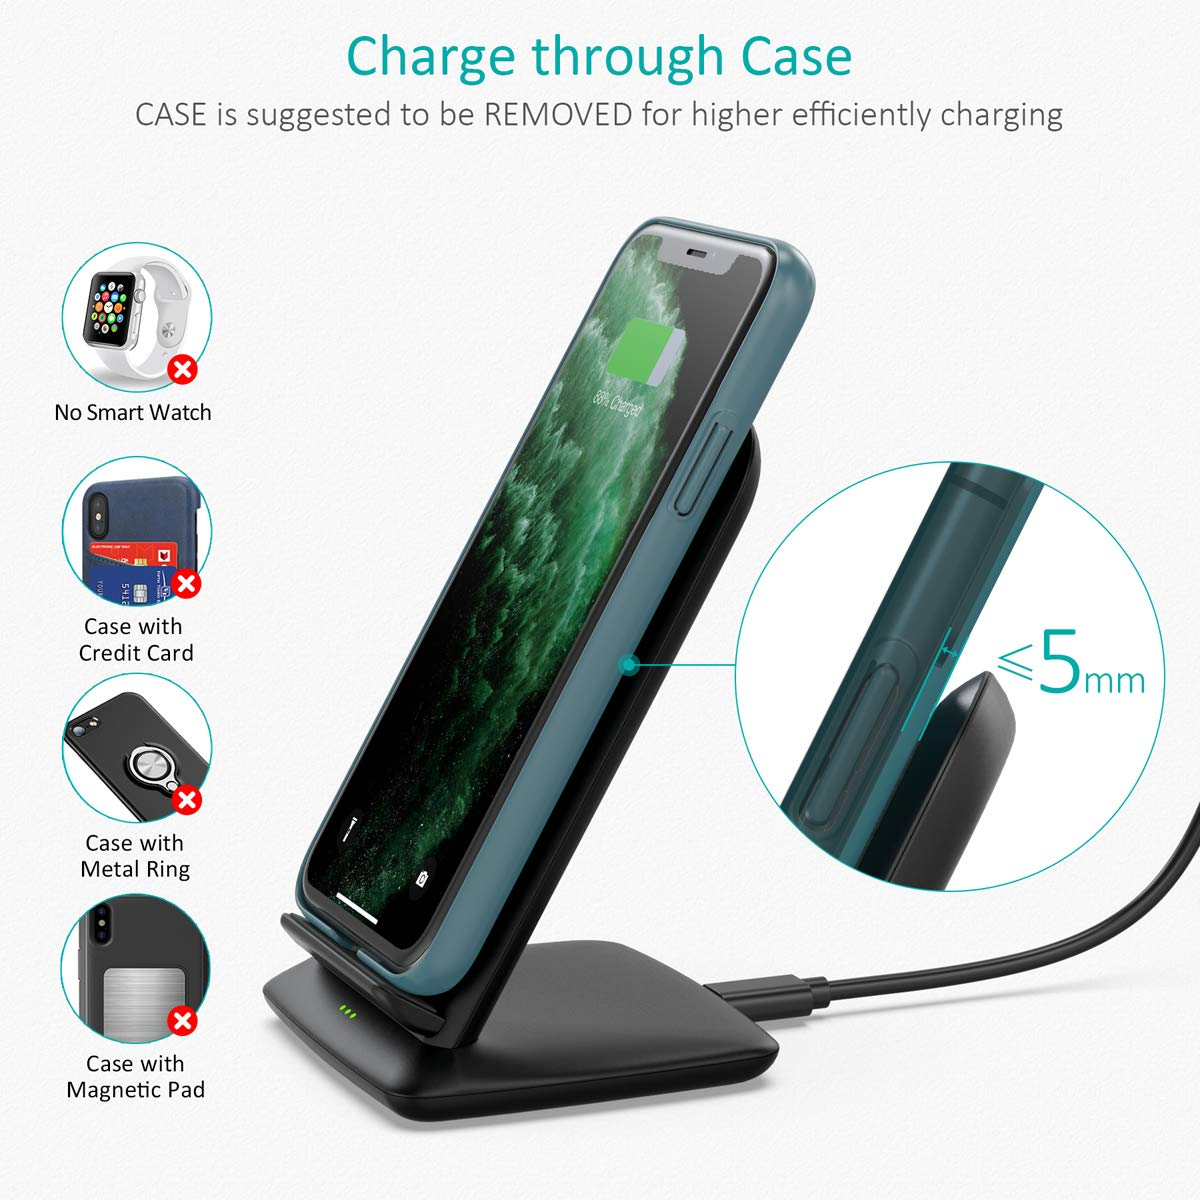 Carga sin Cable con Adaptador QC 3.0 CHOETECH 15W Cargador Inal/ámbrico R/ápido 7.5W para iPhone11//11Pro //XS//XR//X // 8//8 Plus etc. Huawei P30 Pro//Mate 20 10 W para Samsung S10//S9//Note10//Note9//S8